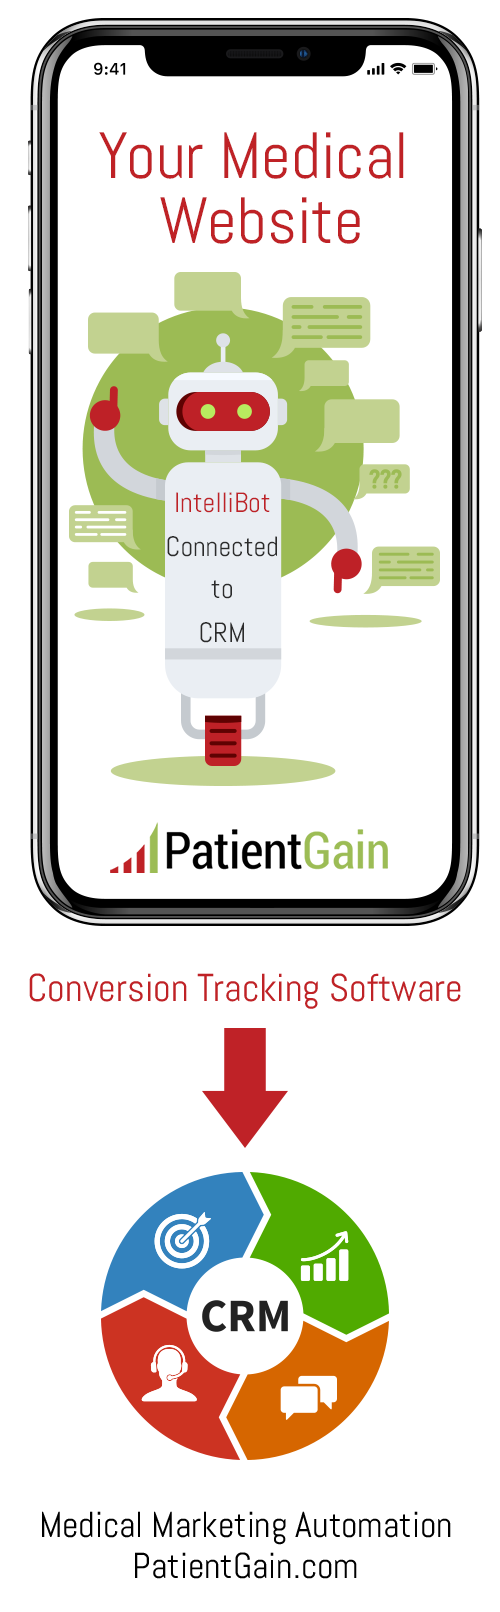 Urgent Care Mobile Marketing Example 2